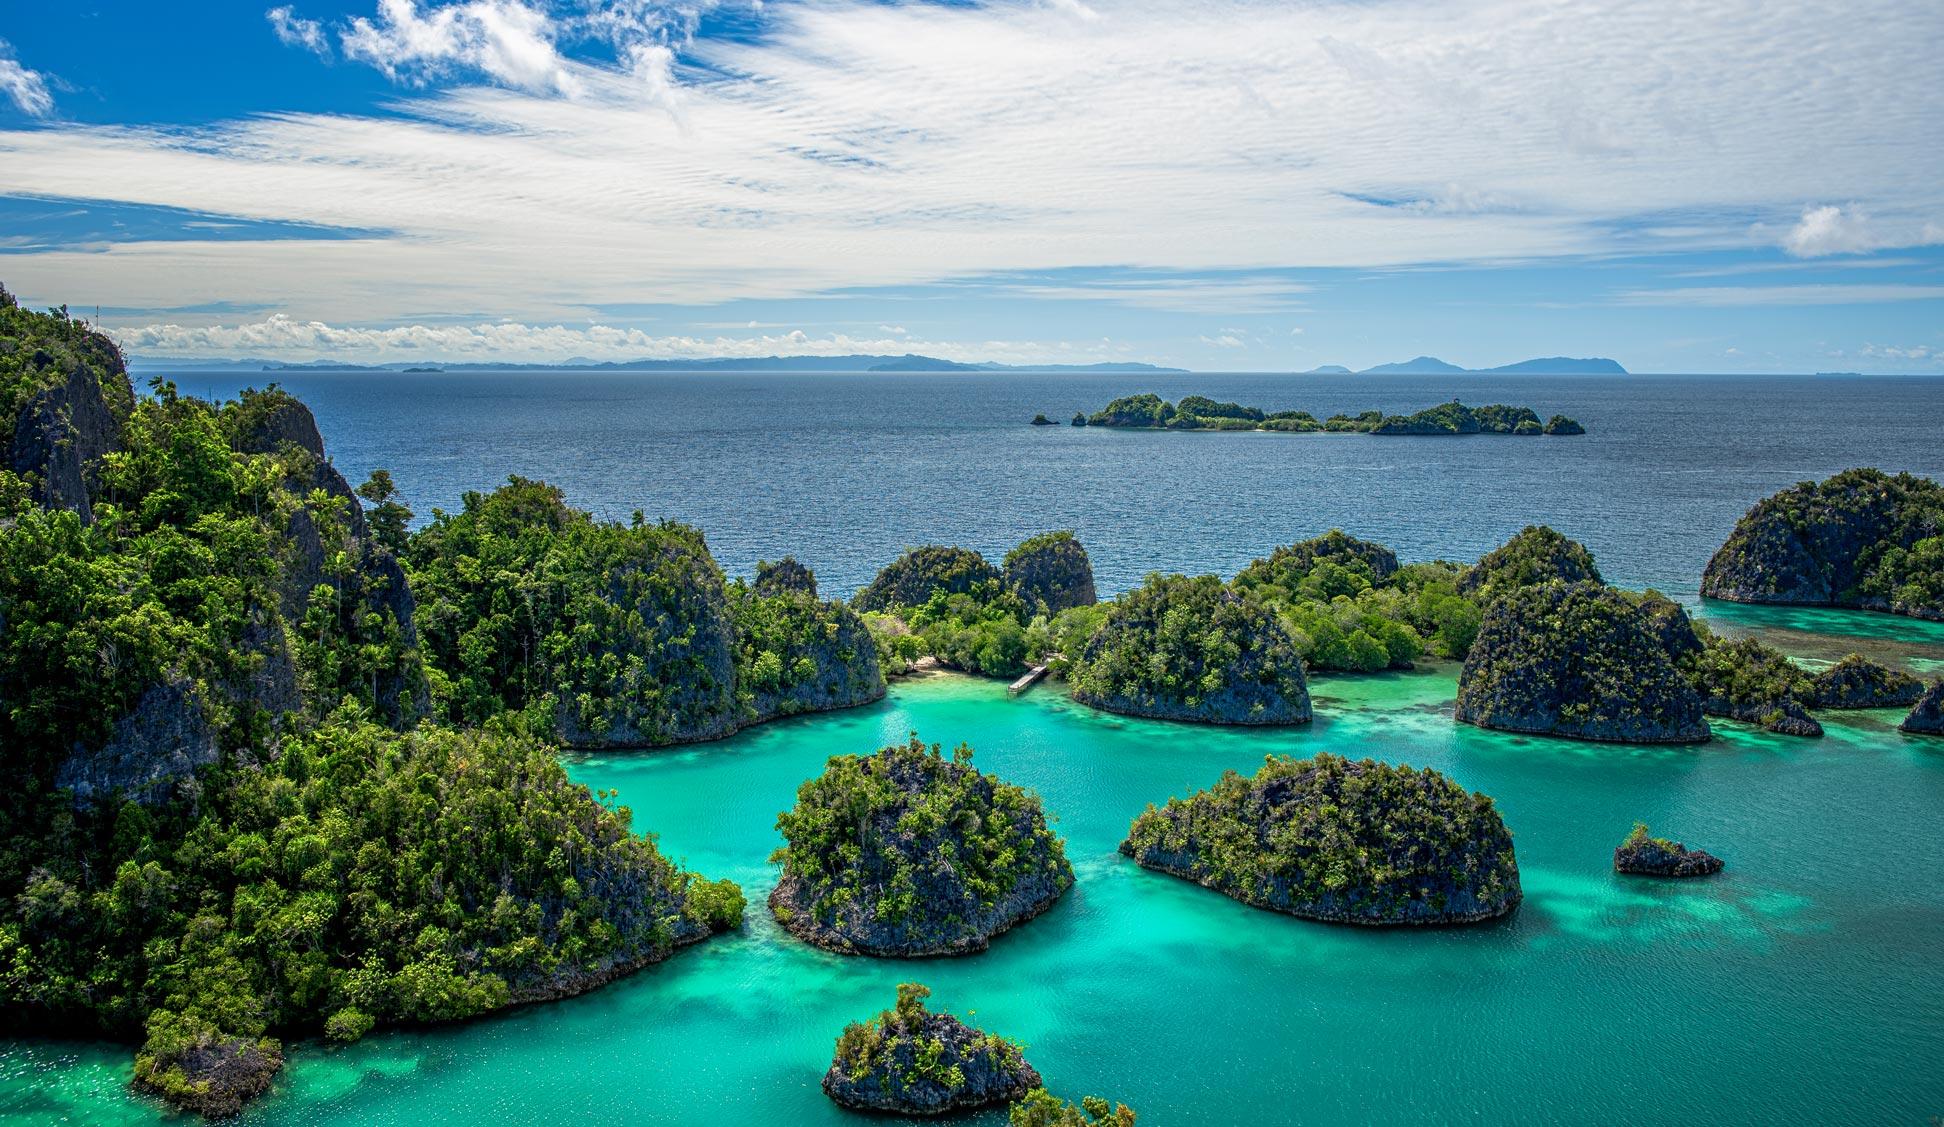 https://www.nationsonline.org/gallery/Indonesia/Piaynemo-West-Papua.jpg